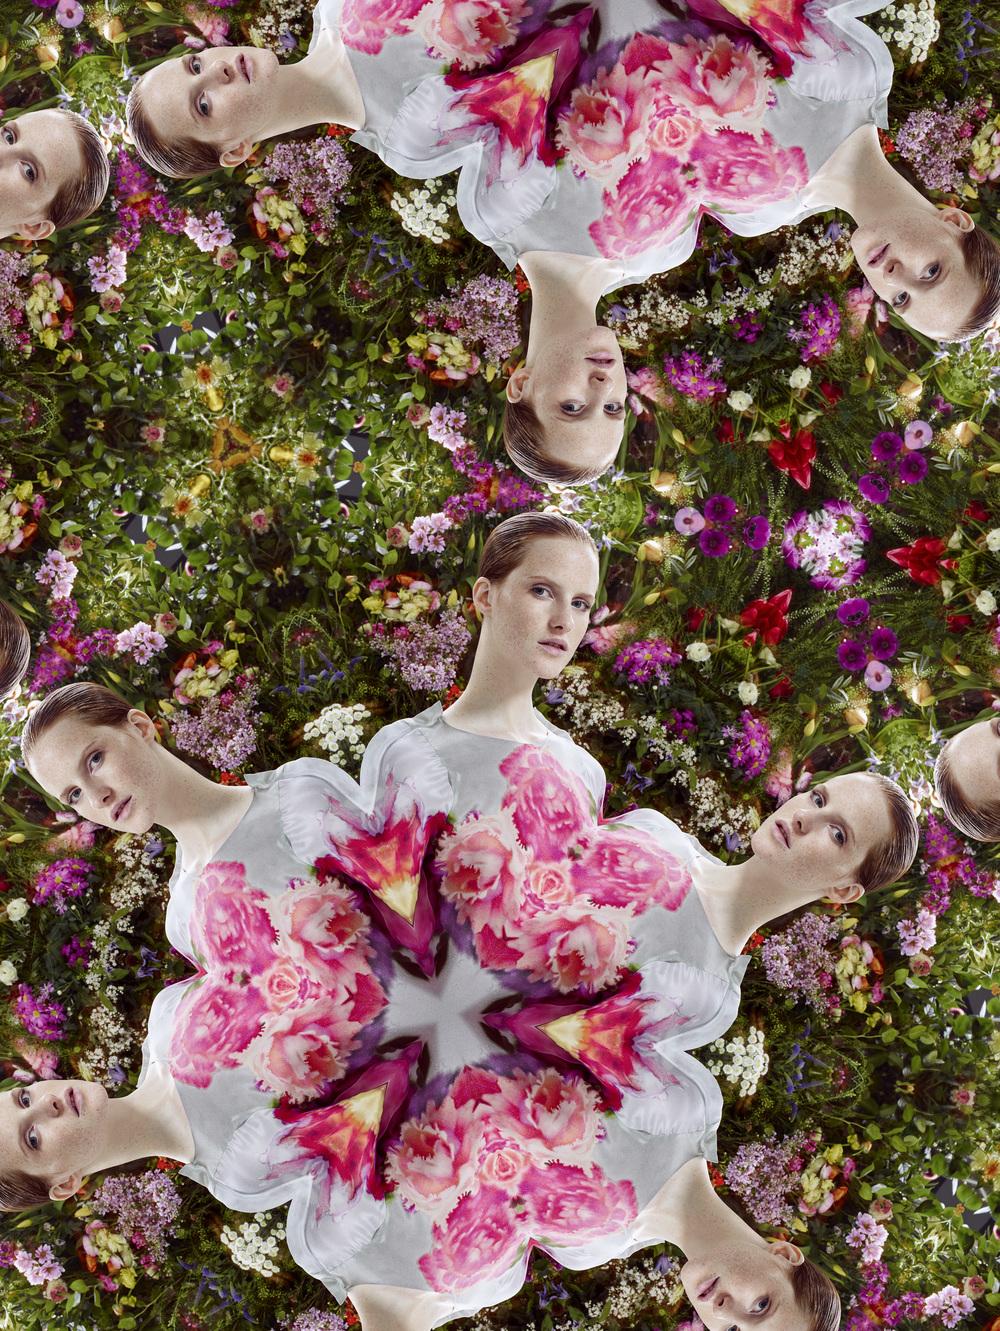 NORDSTROM_06_0019_04-kaleidoscope.jpg